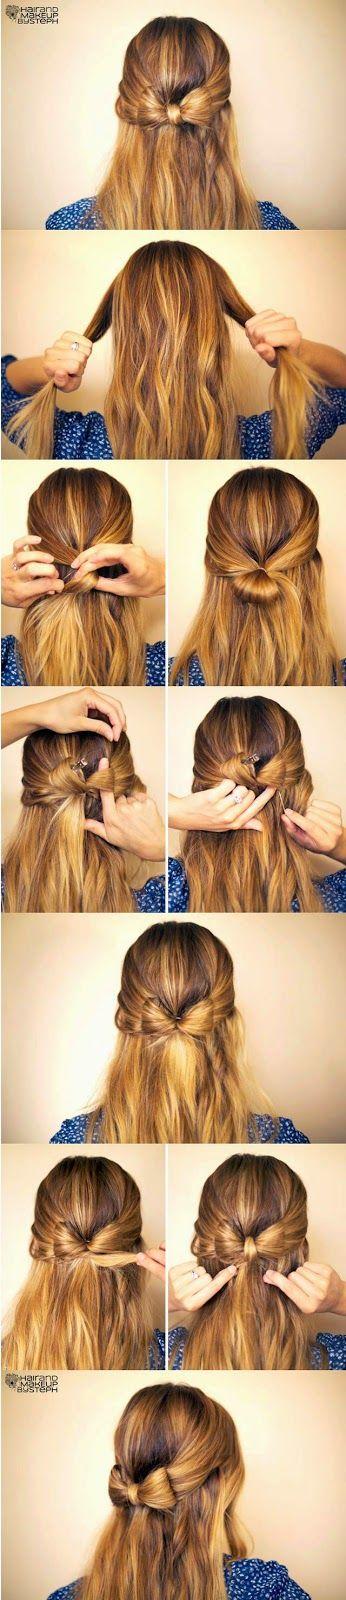 Tremendous 1000 Ideas About Diy Hairstyles On Pinterest Easy Diy Short Hairstyles For Black Women Fulllsitofus